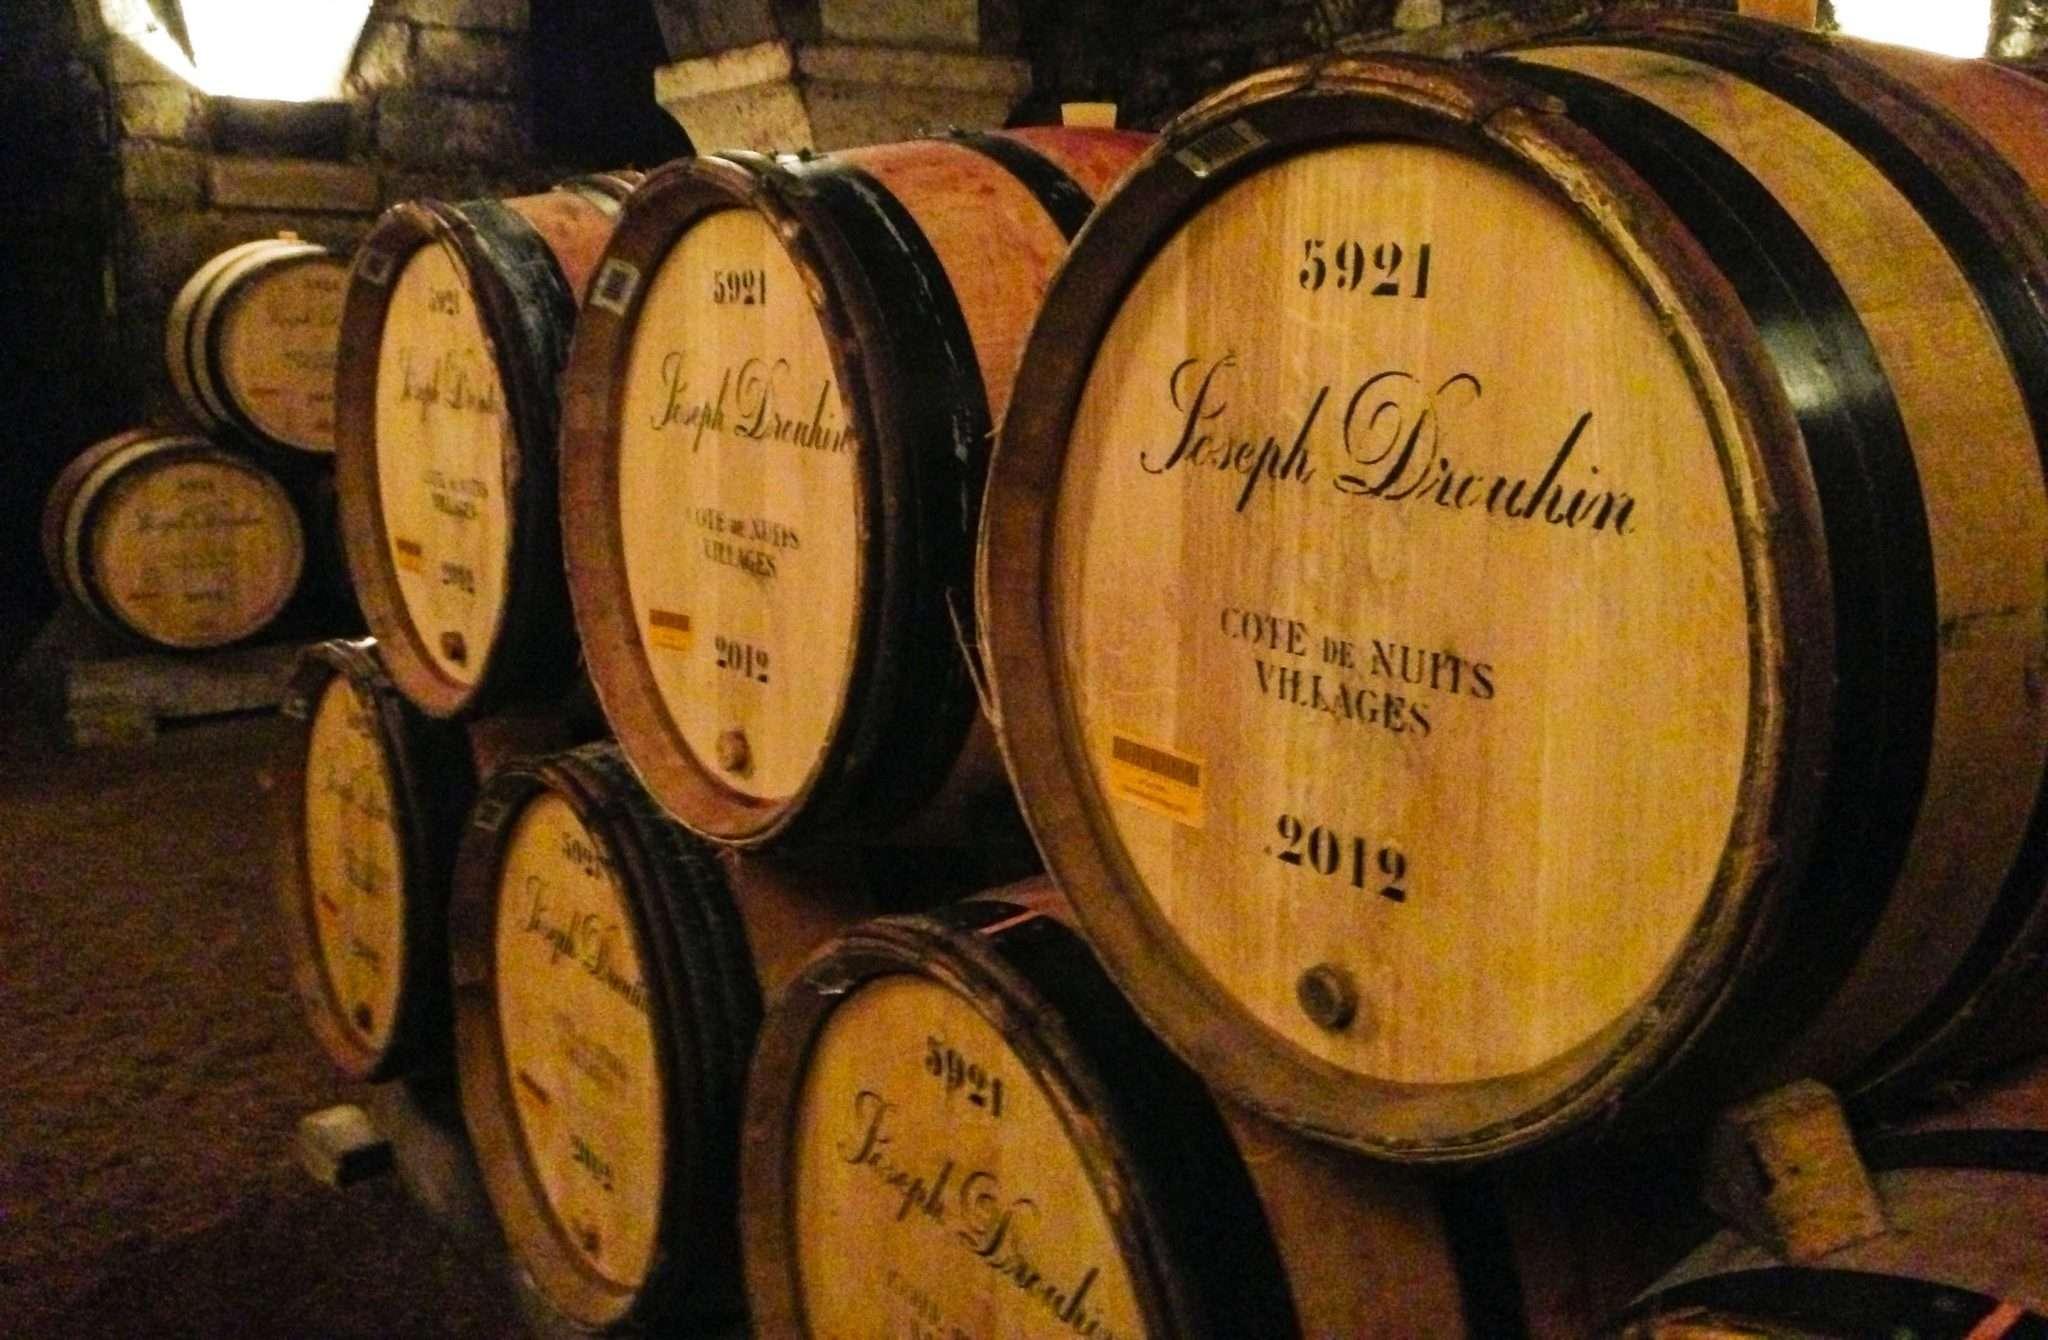 Oak barrels at Joseph Drouhin, Burgundy, France